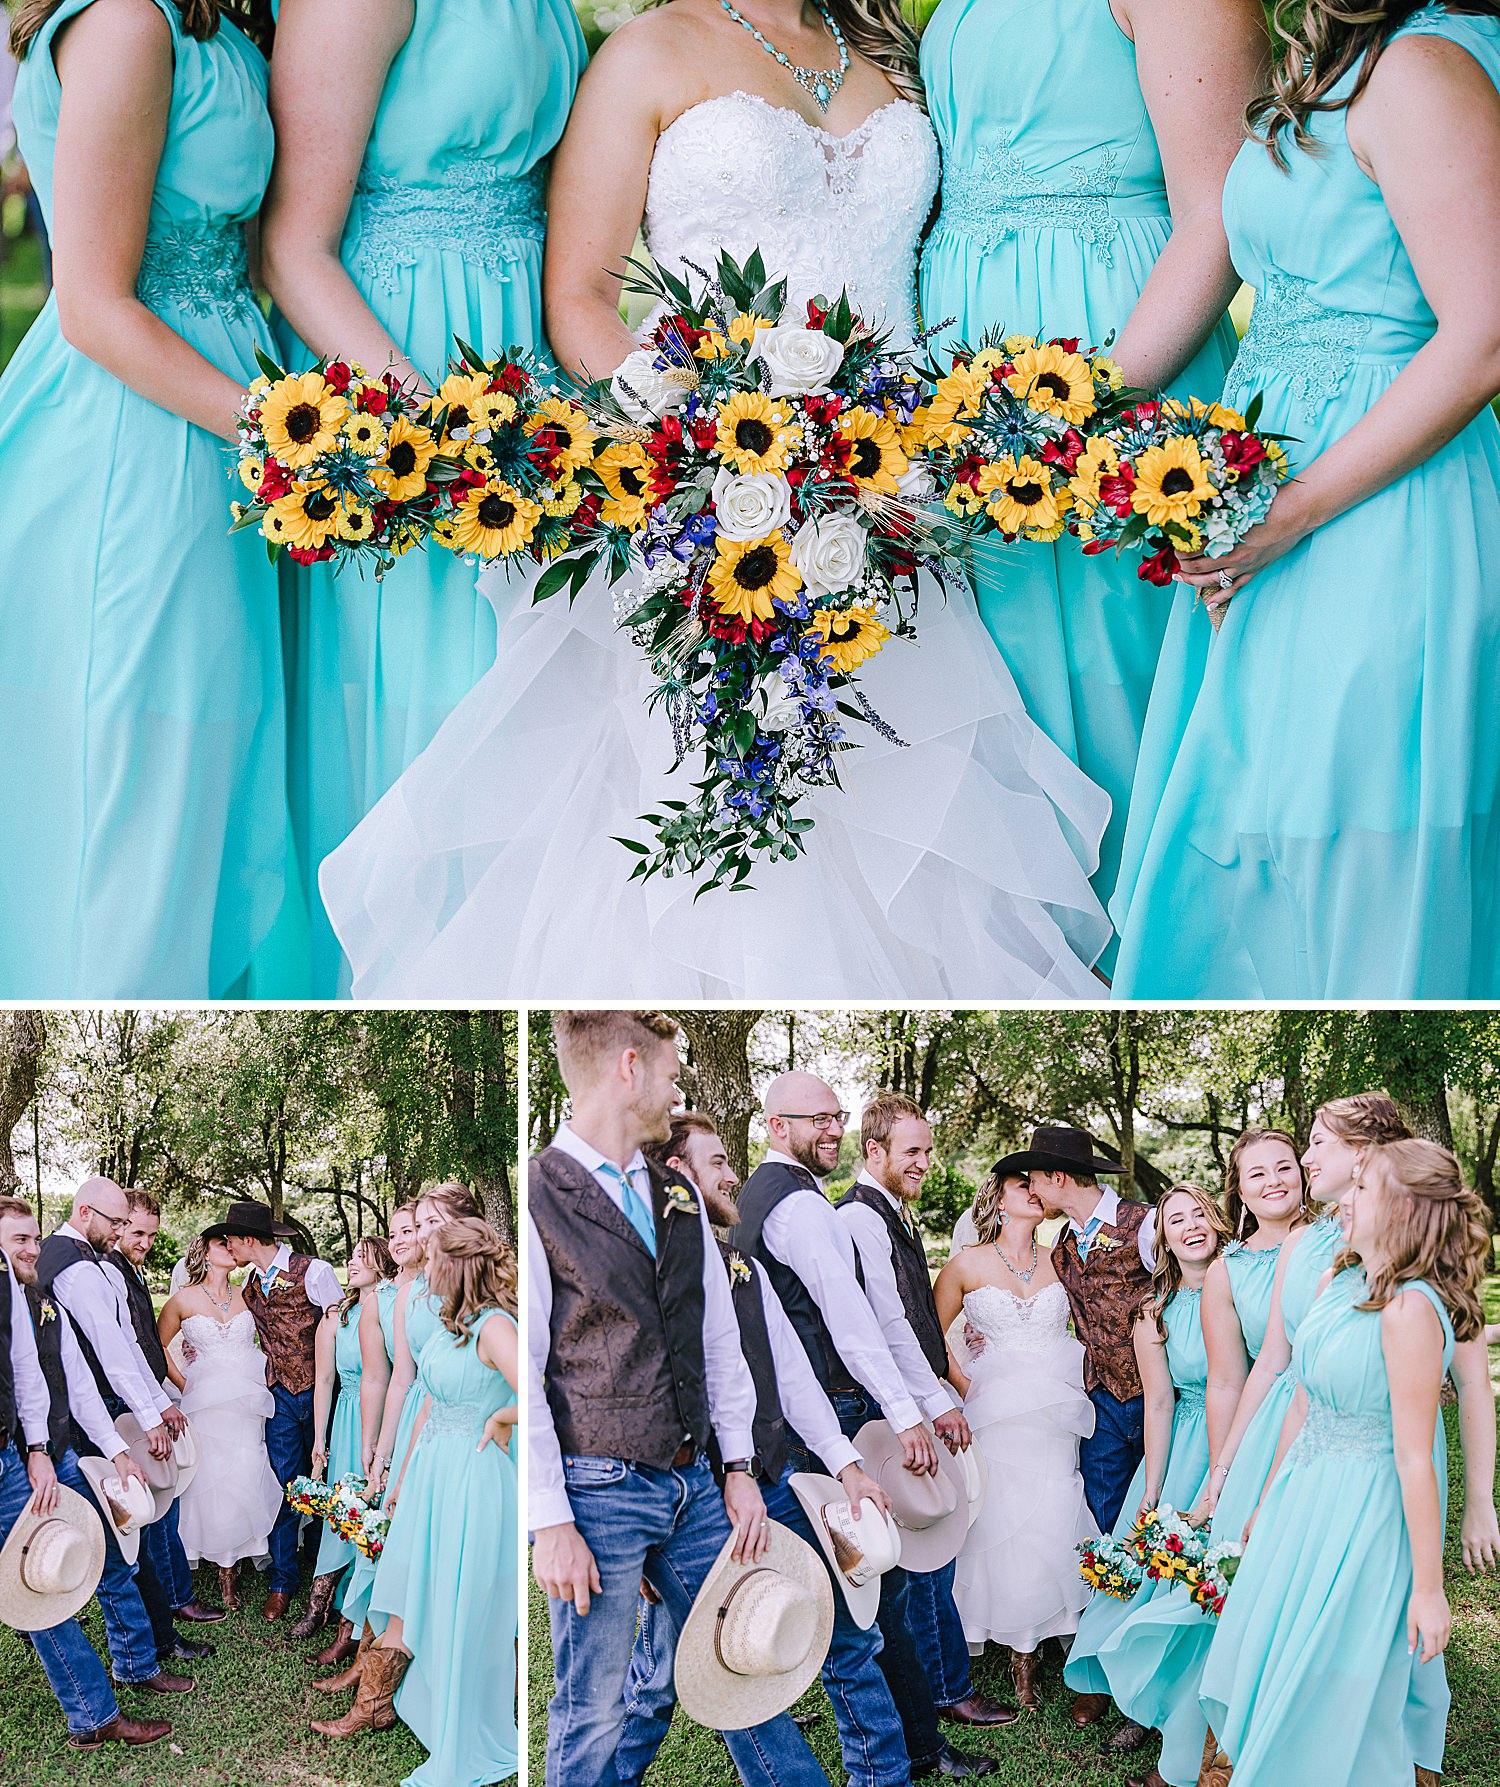 Carly-Barton-Photography-Old-Town-Texas-Rustic-Wedding-Photos-Sunflowers-Boots-Kyle-Texas_0056.jpg